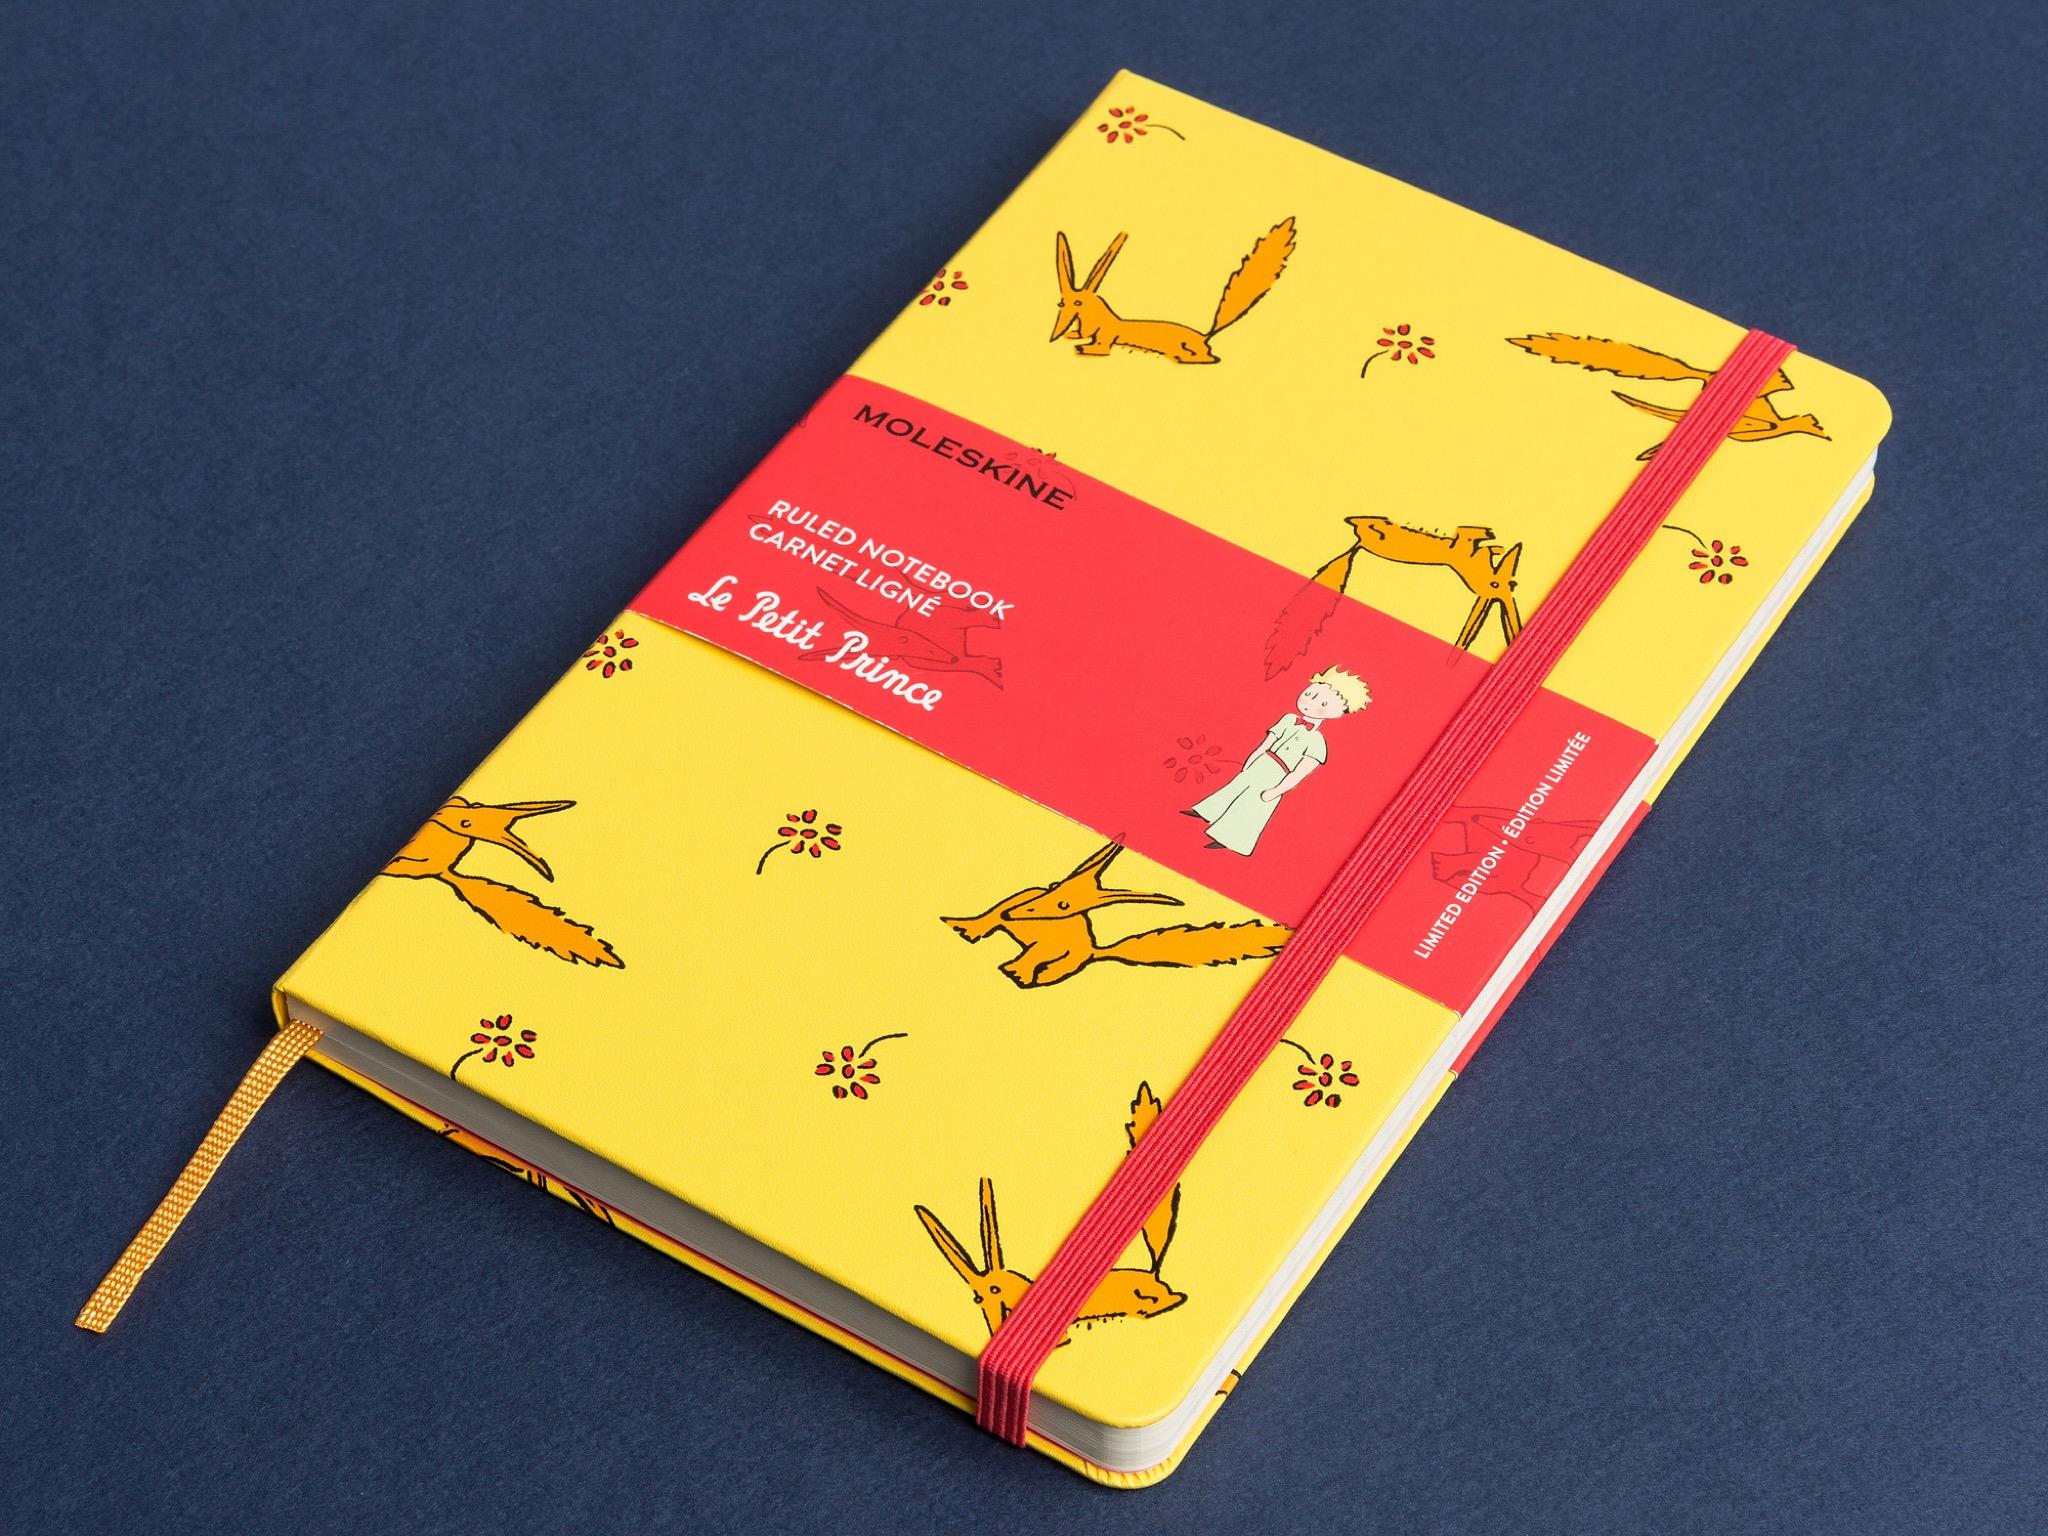 RS98912_Moleskine_Petit Prince_limited edition_large_yellow 1-lpr